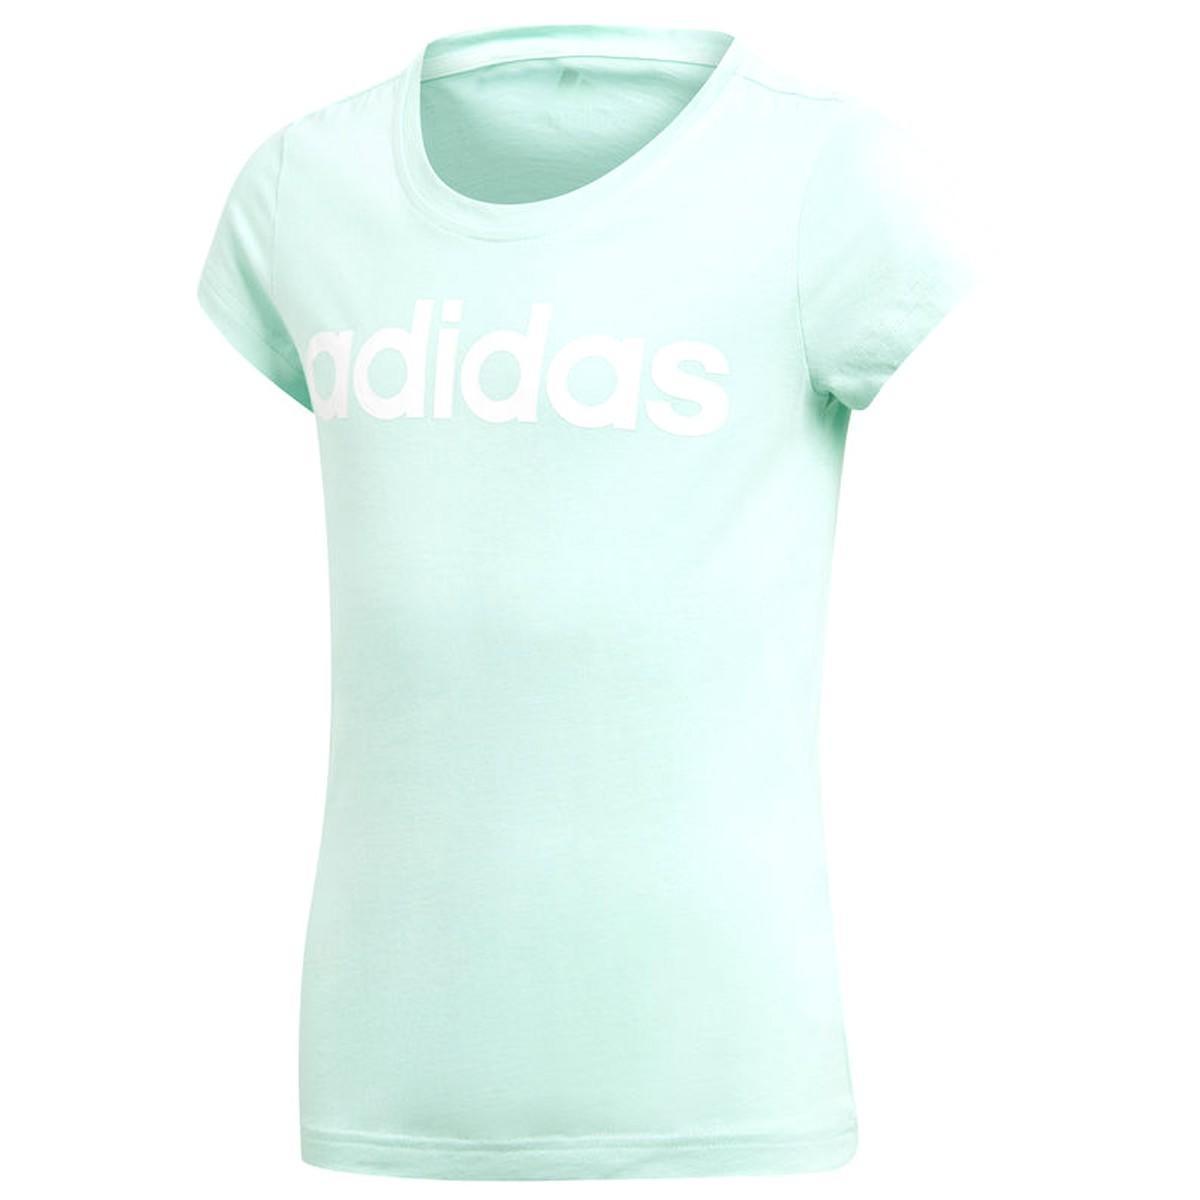 Теннисная футболка детская Adidas Training Linear T-Shirt clear mint/white